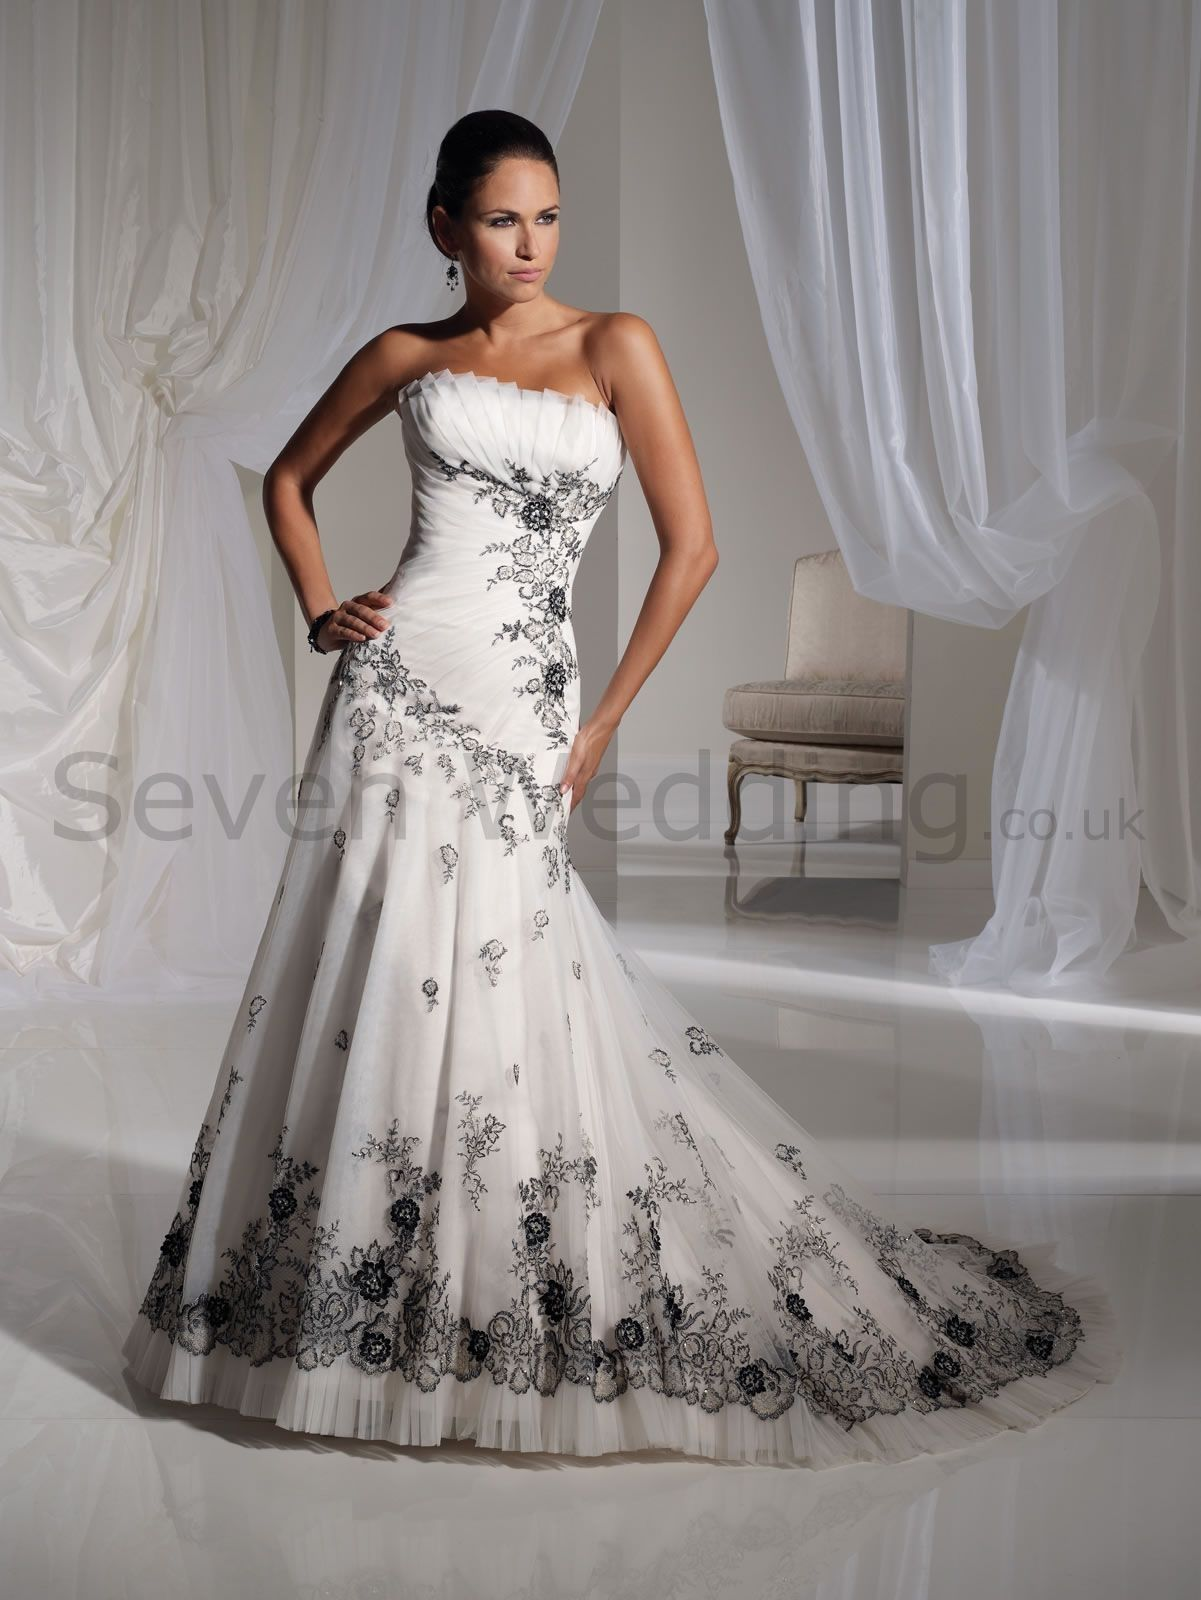 Beautiful black and white wedding dress wedding inspiration beautiful black and white wedding dress ombrellifo Choice Image